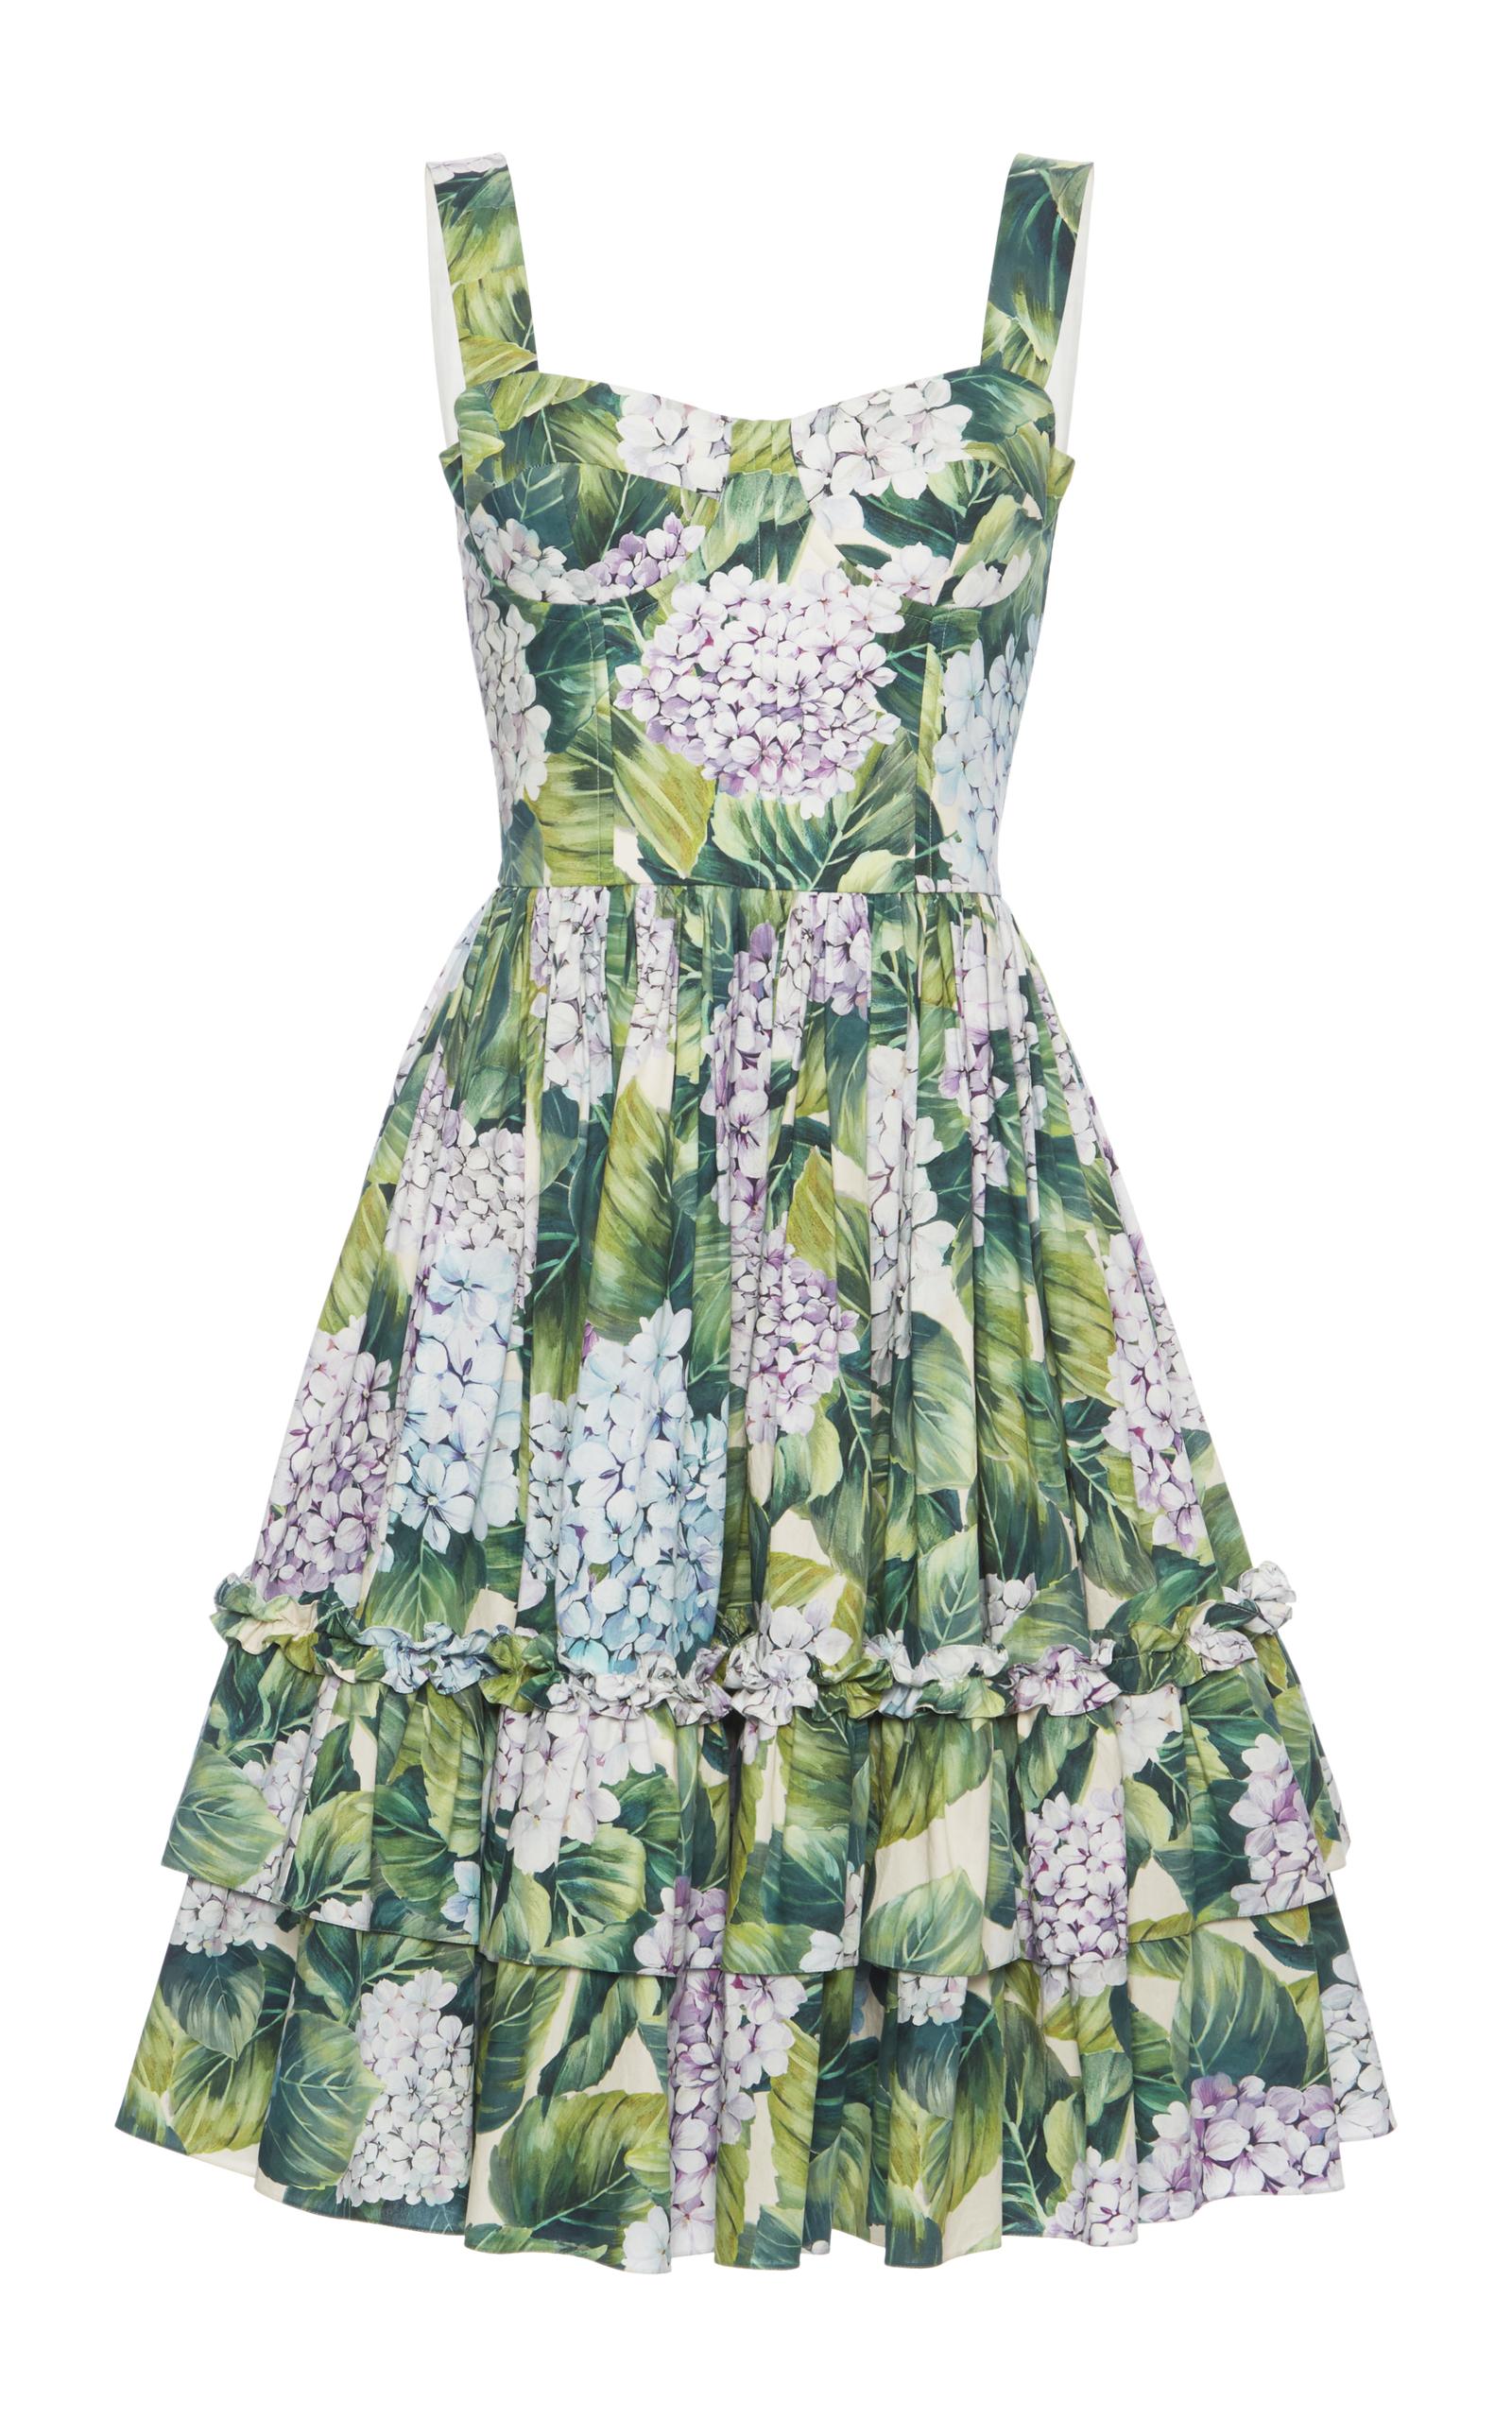 Discount Cost Dolce & Gabbana floral-print dress Clearance Best Place SfcKk